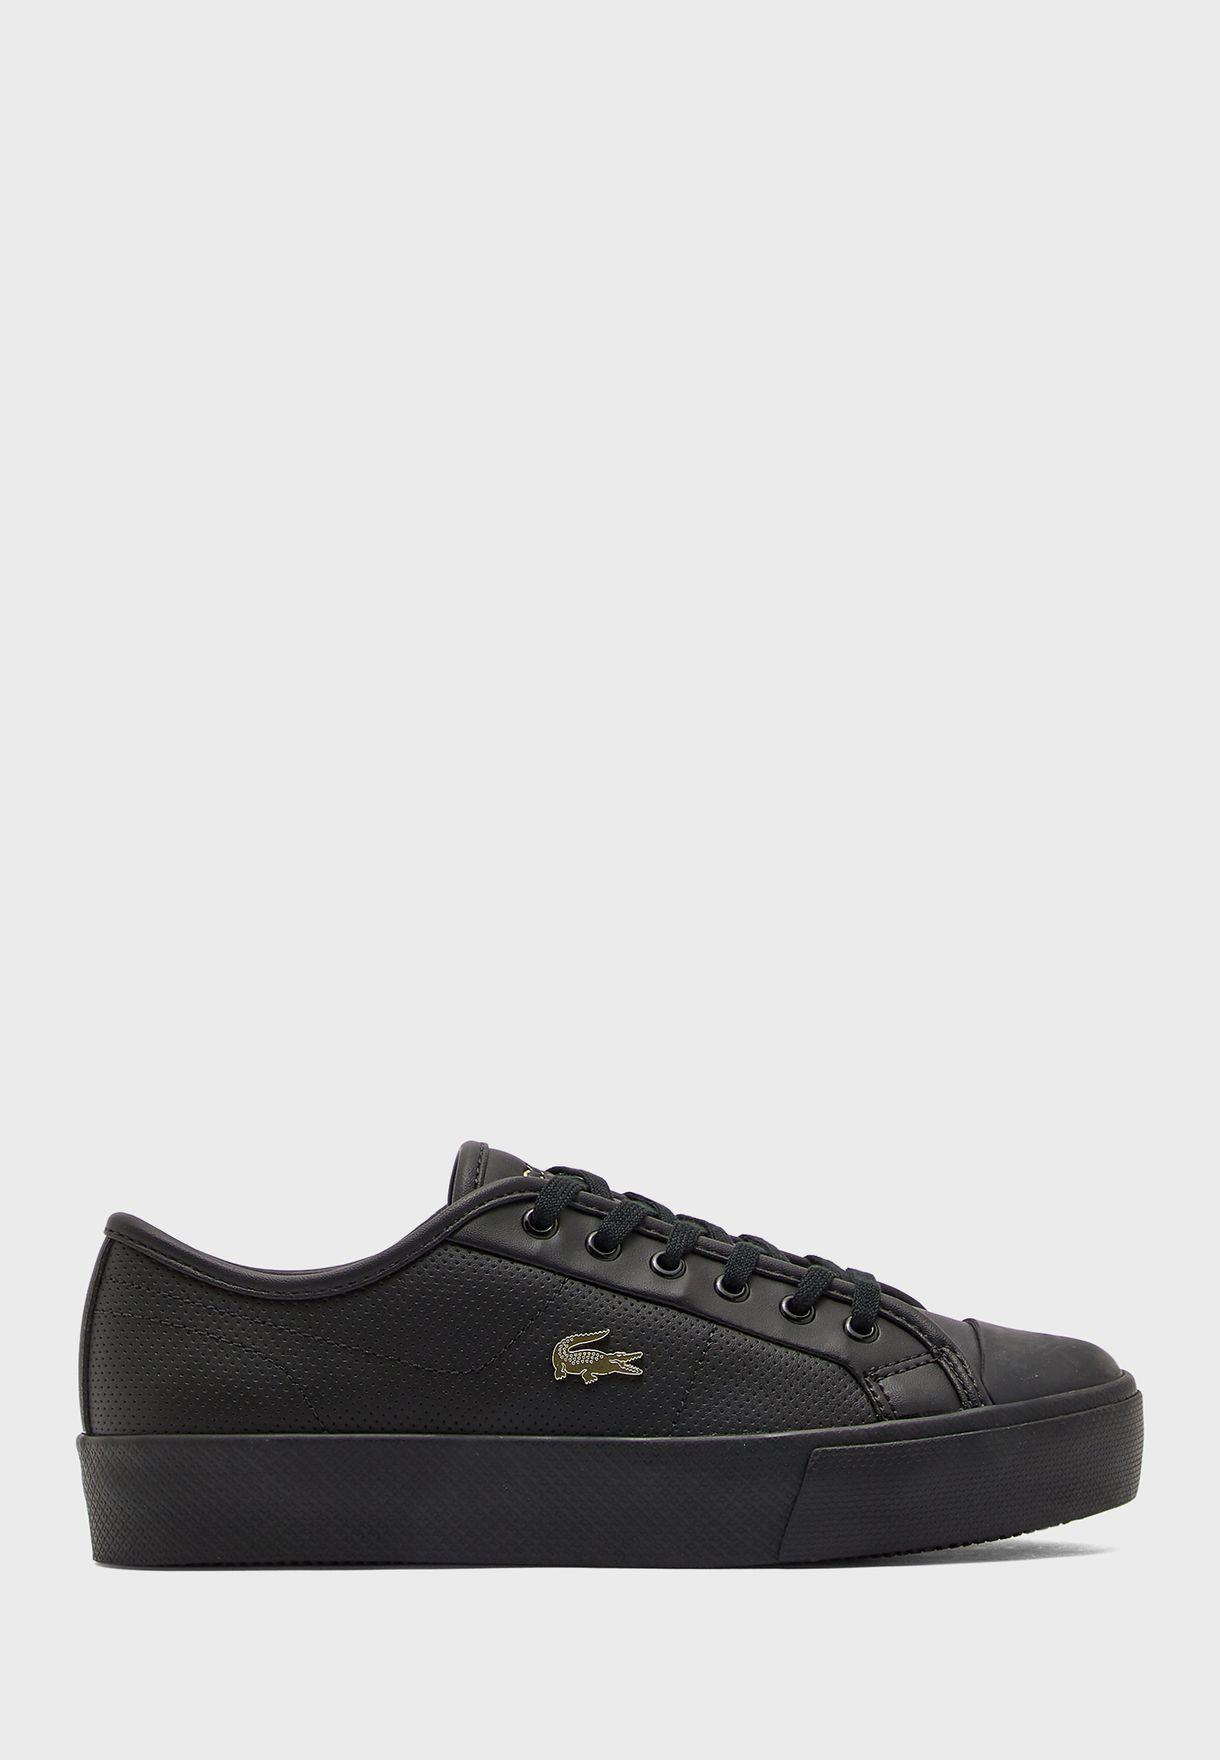 Ziana Plus Low Top Sneakers